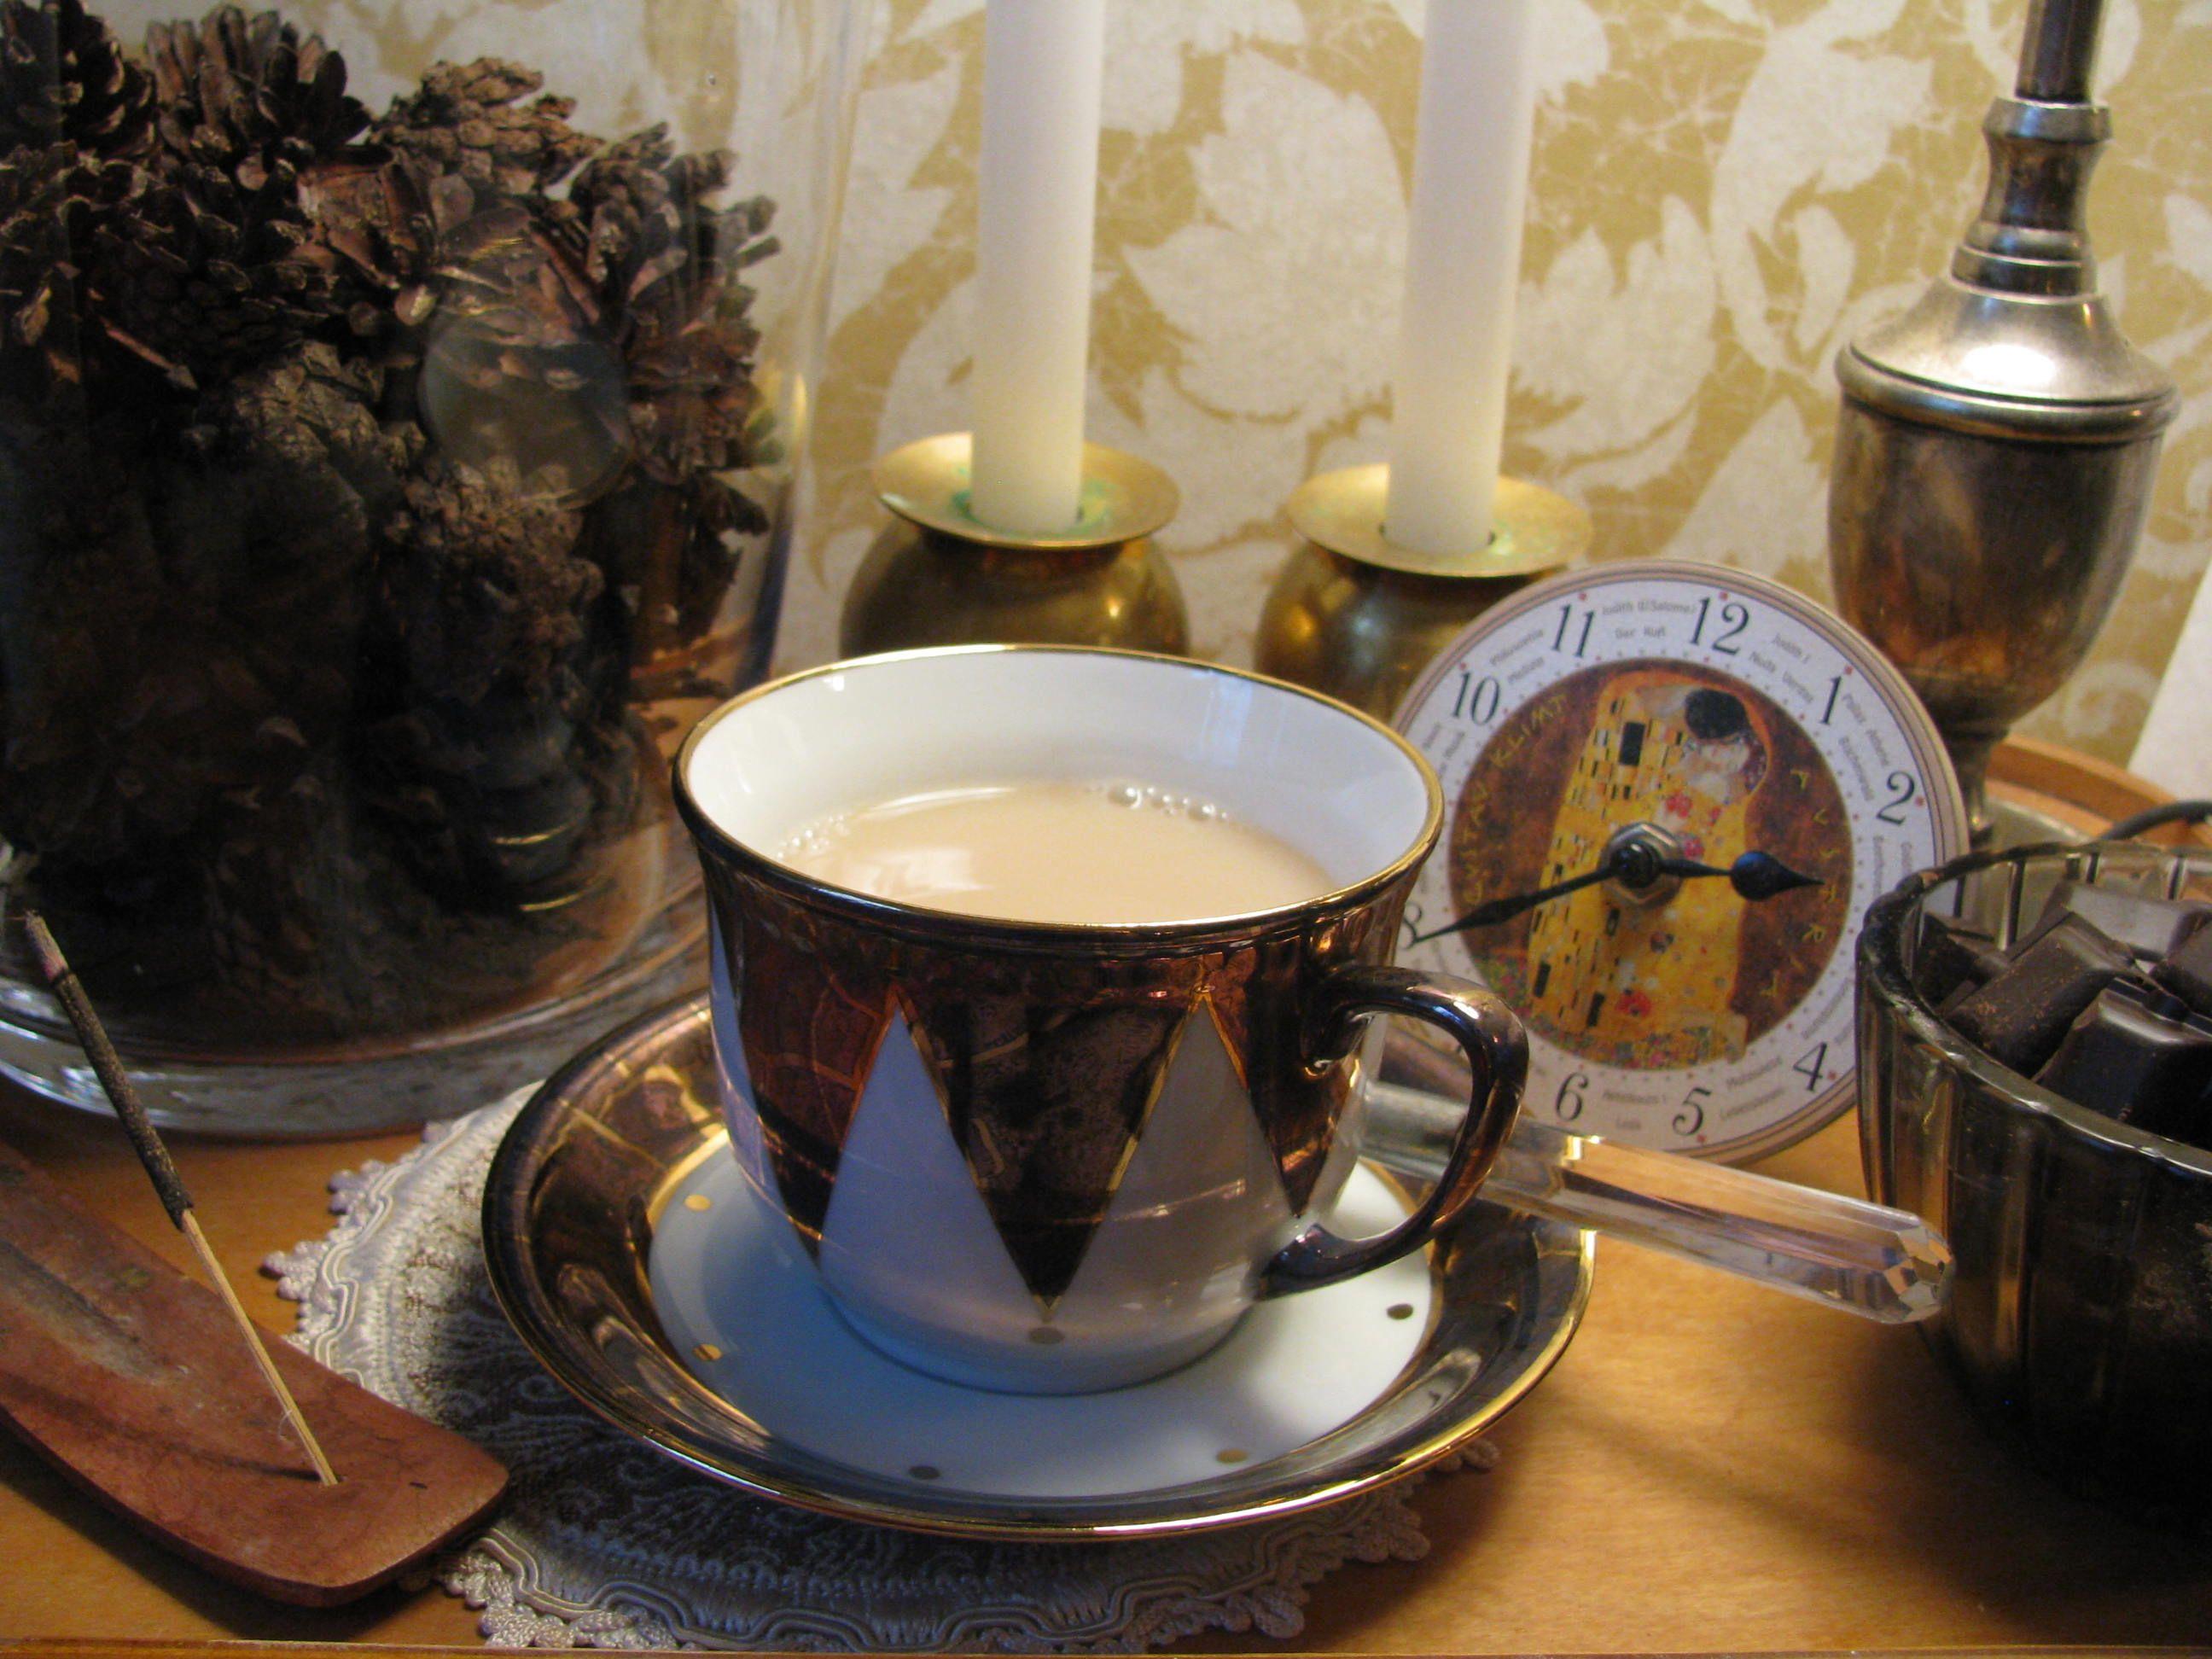 pinecones in a glass vase, chai latte and dark chocolate - cozy winter. Tea cup decor by #ARS_Portselan: www.arsportselan.ee www.facebook.com/arsportselan